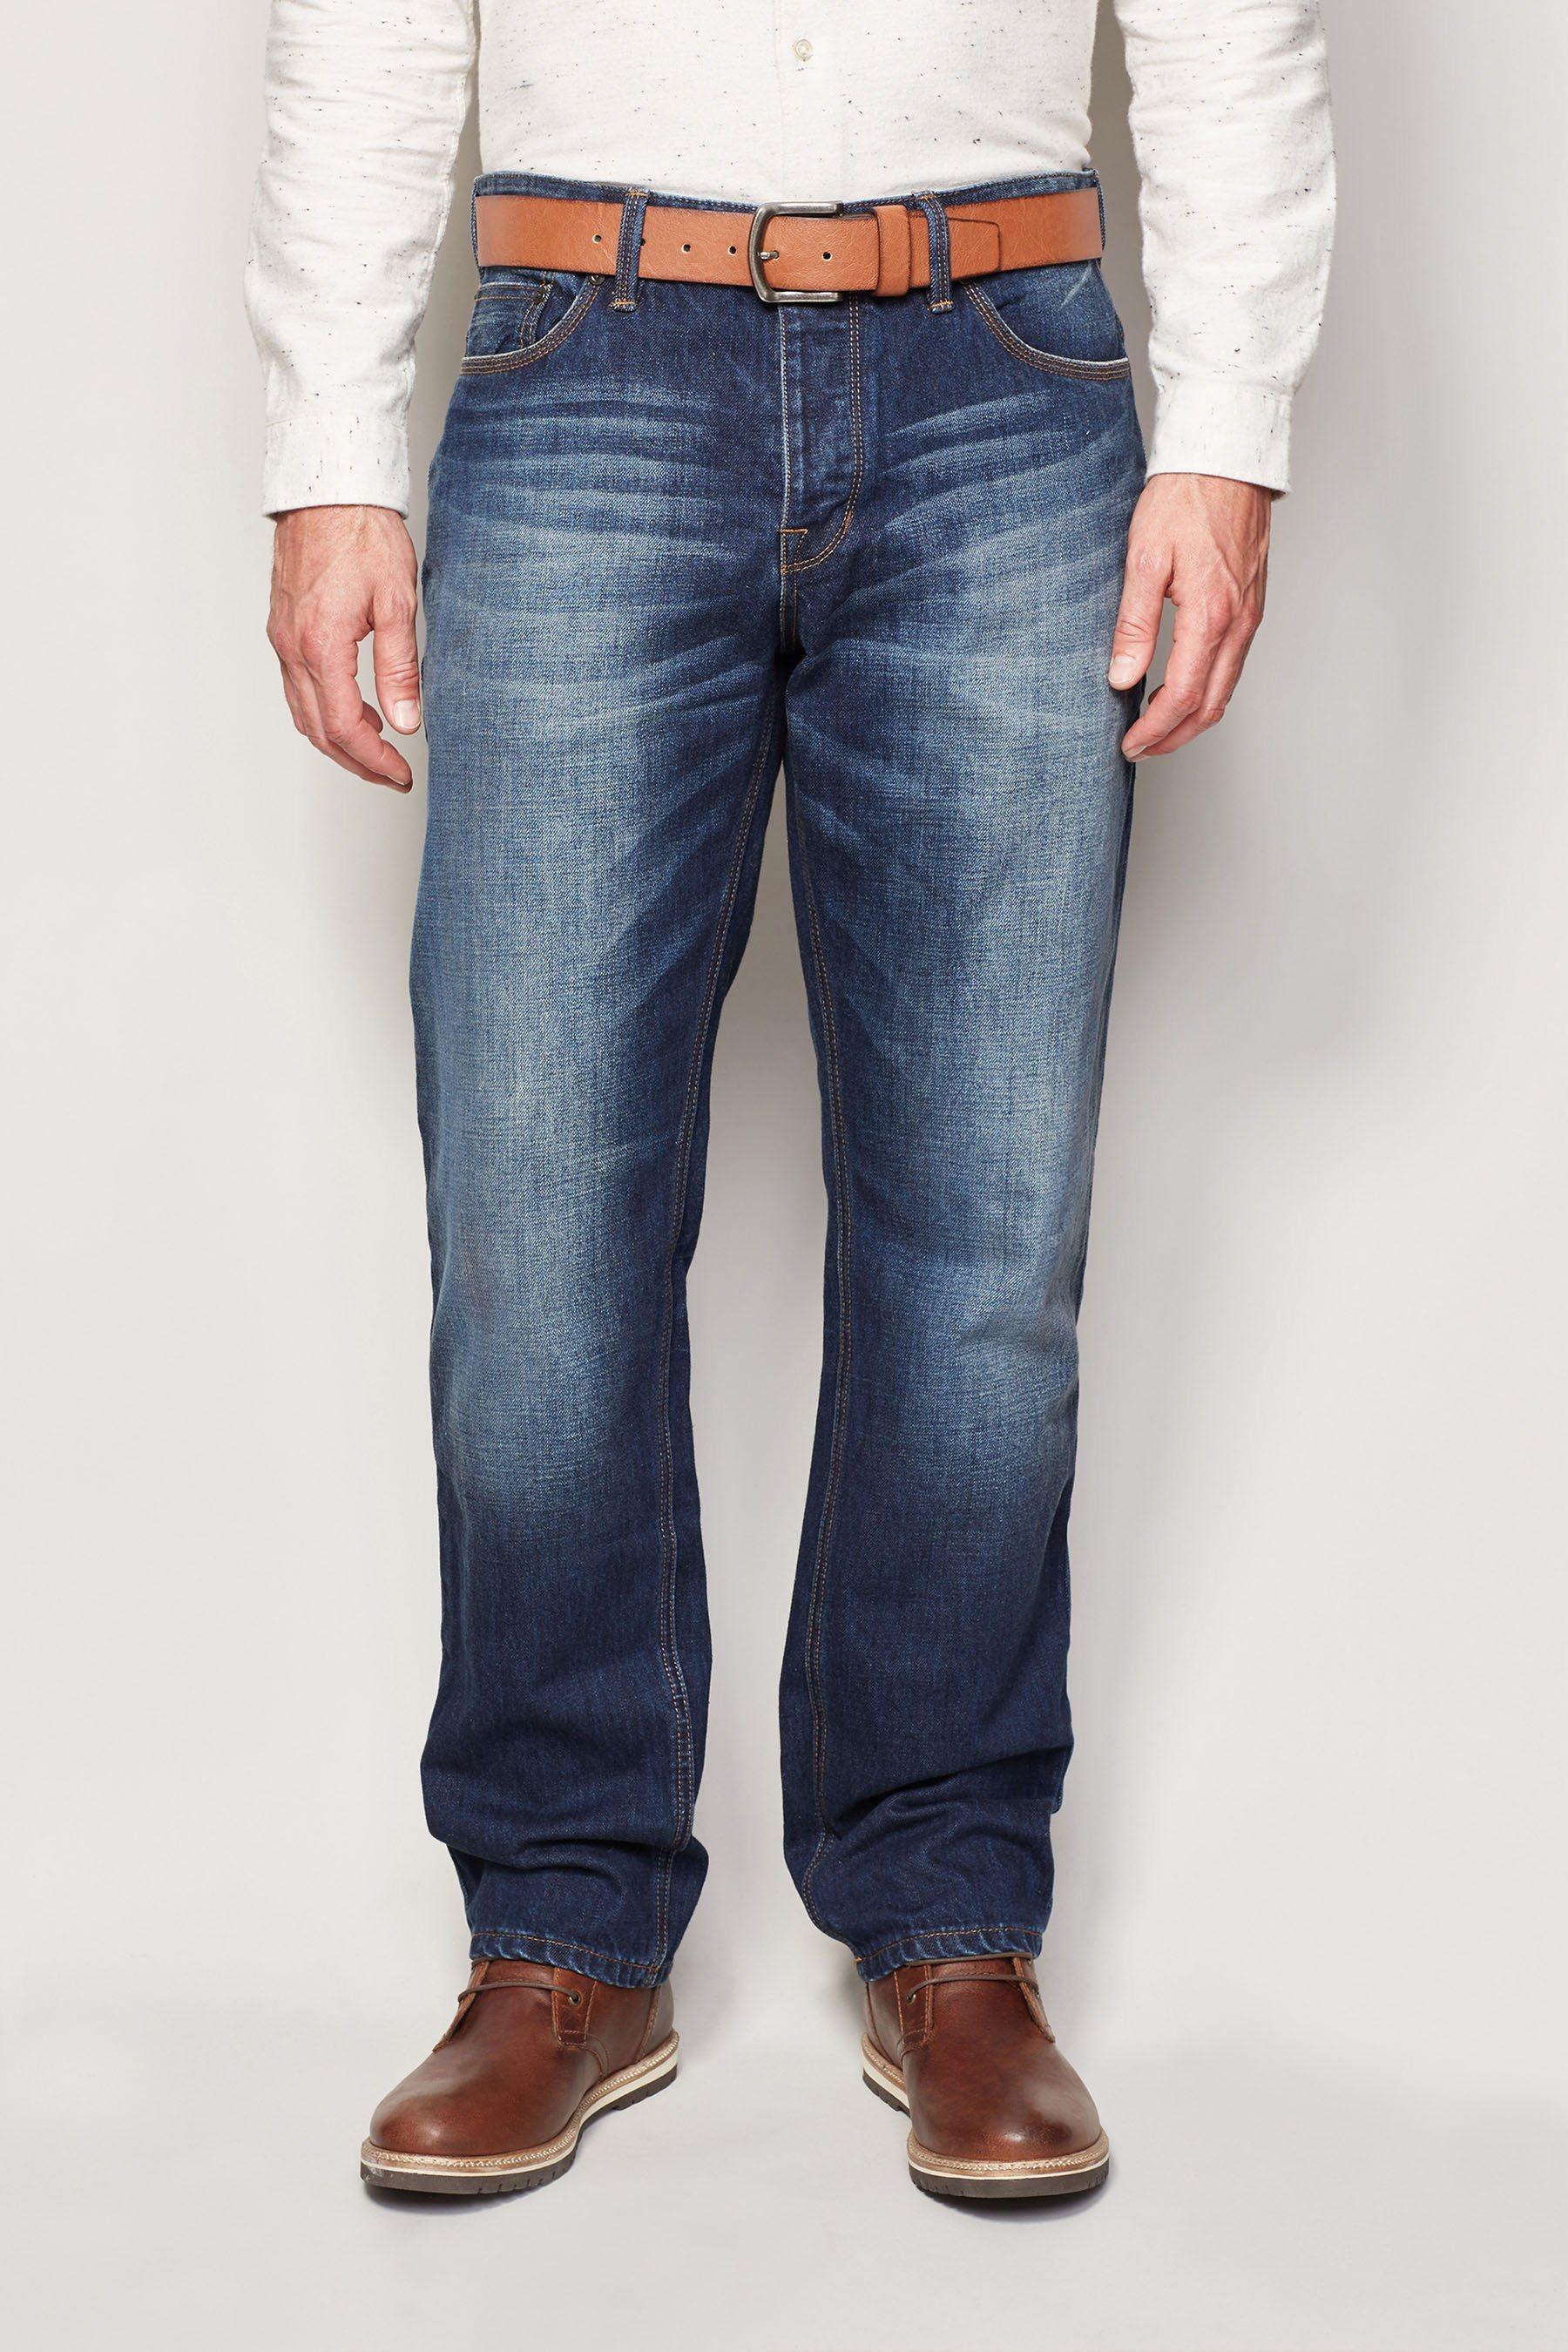 Next Straight-Fit Vintage Blue Jeans mit Gürtel 2 teilig